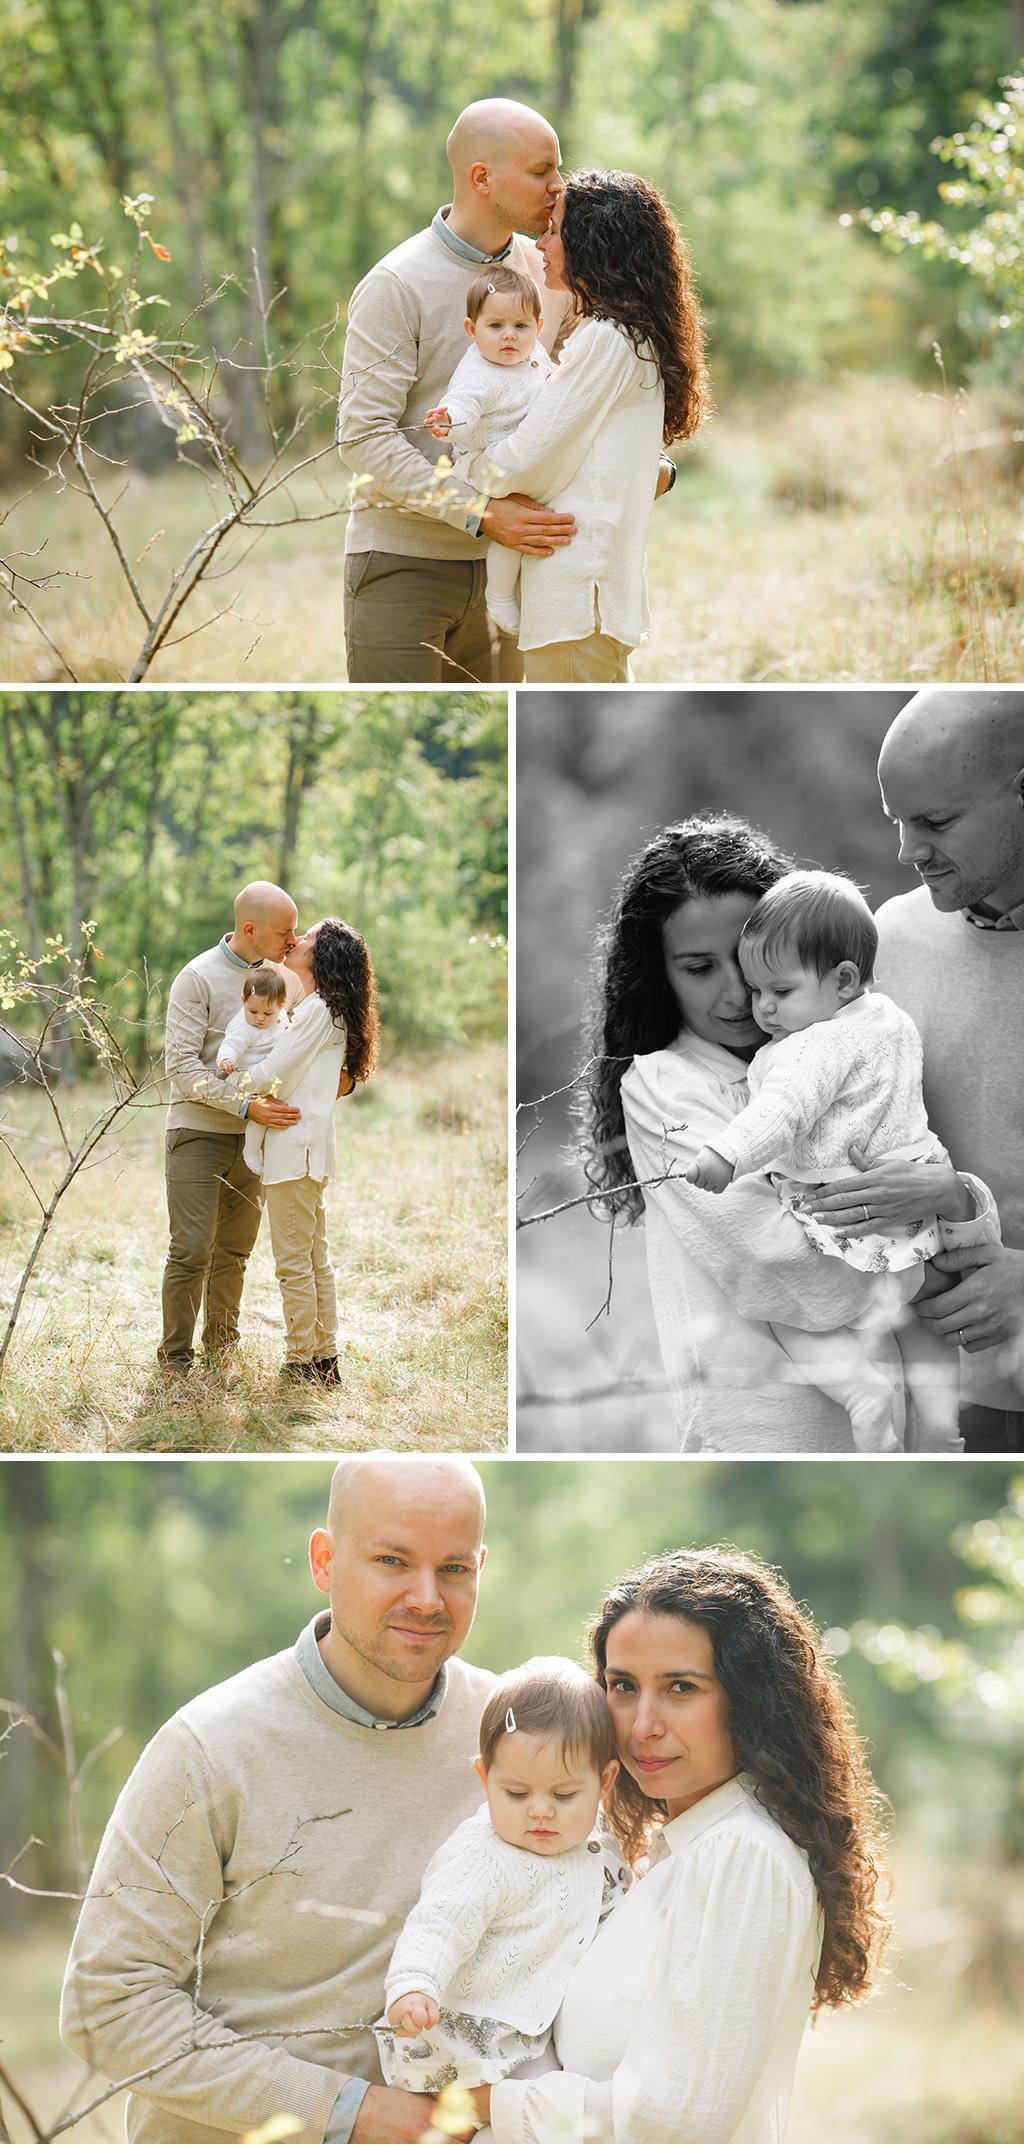 Forsta_familjefotografering_Stockholm_Familjefotograf_11.jpg